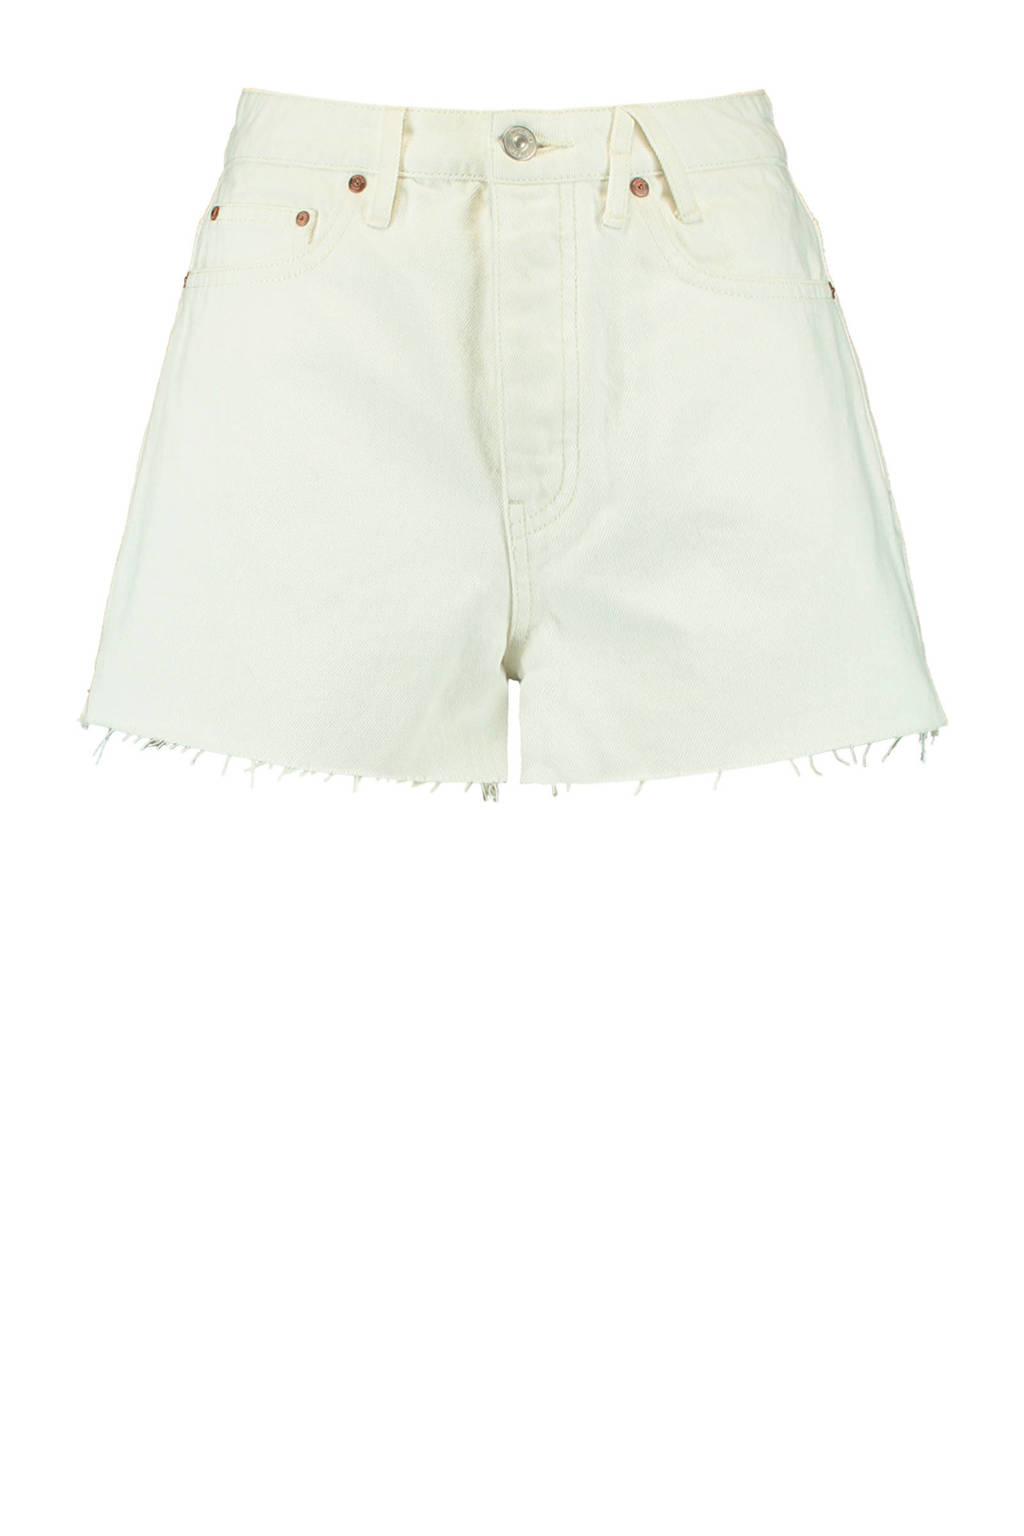 America Today high waist jeans short Jadan off white, Off White